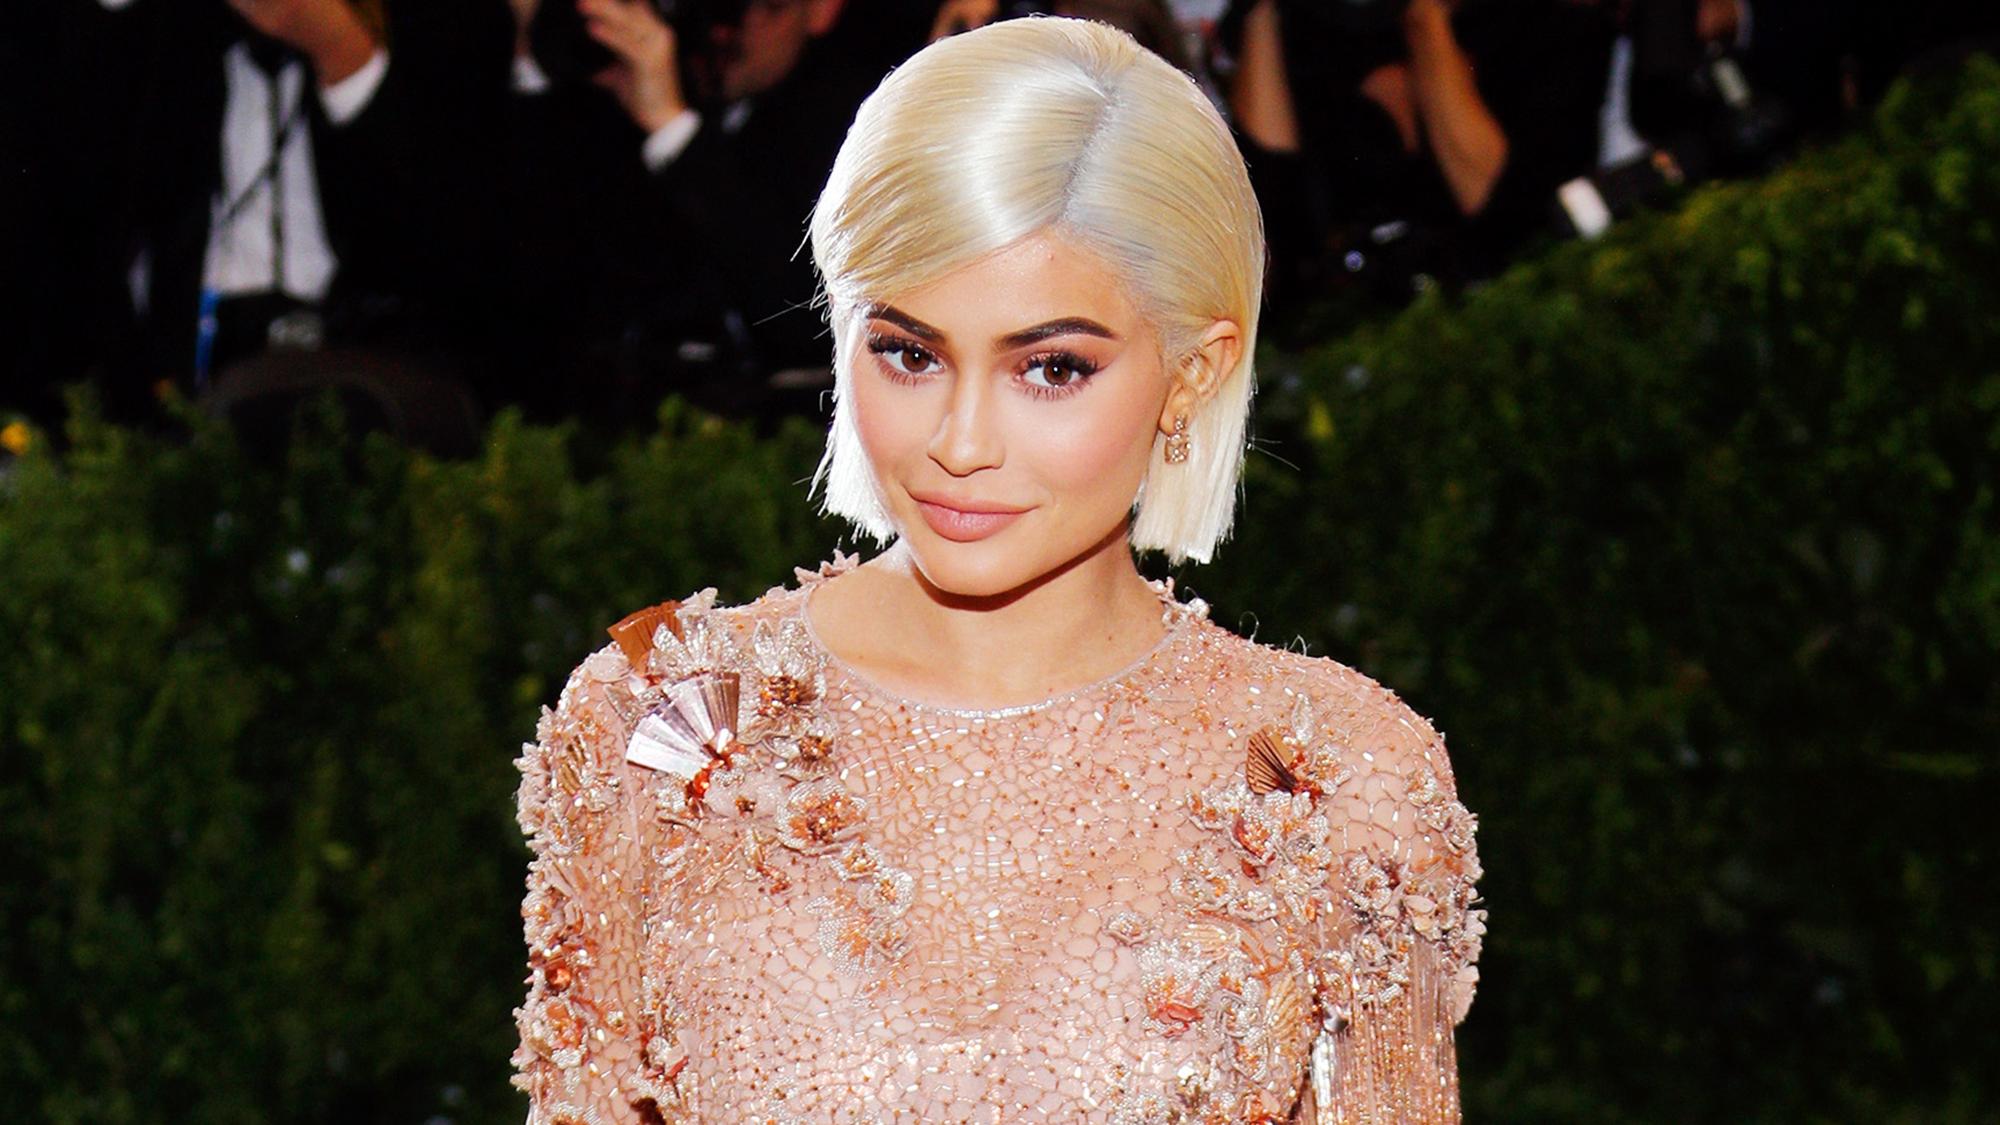 Kylie Jenner New Hair Blunt Bangs Haircut Trend Photos